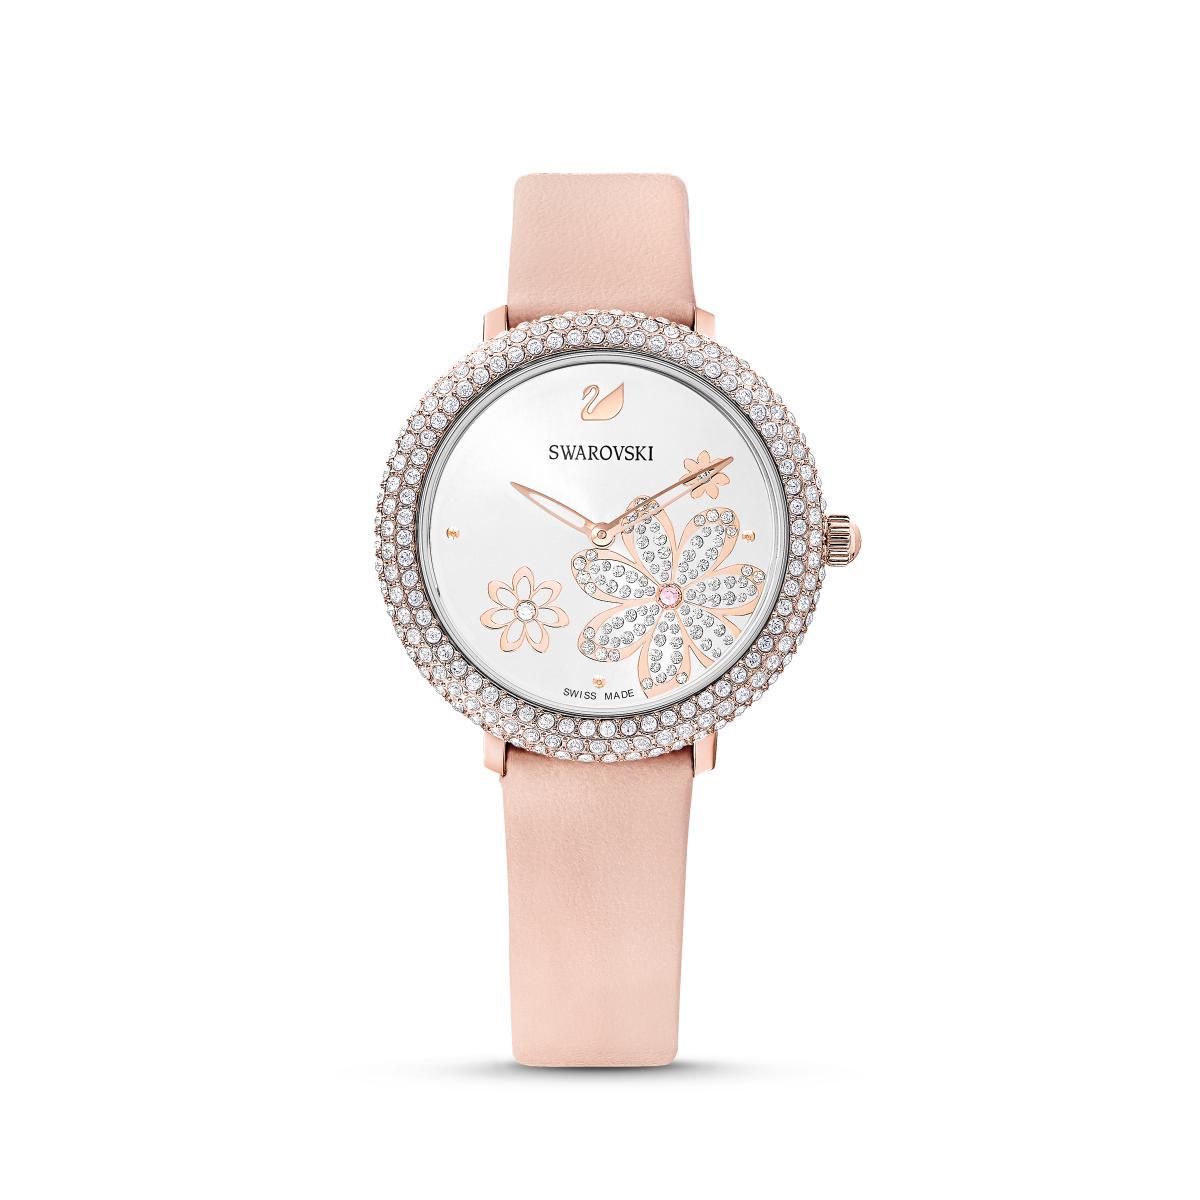 Promo : MONTRES 5519223 - CRYSTAL FROST - Swarovski montres - Modalova